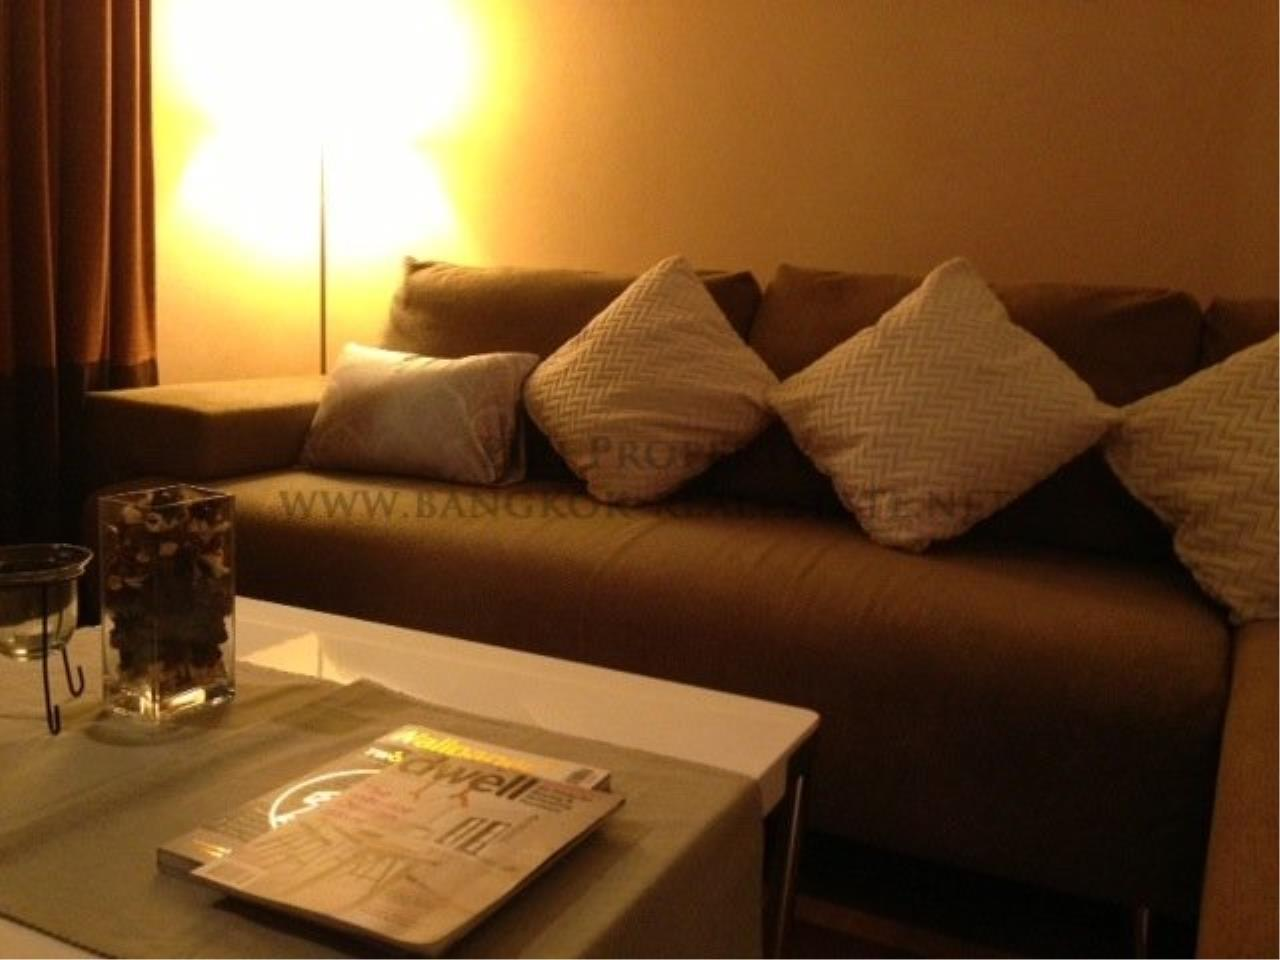 Piri Property Agency's Nice 1 Bedroom Condo near Ratchtewi BTS Station - 58 SQM - 30K 5